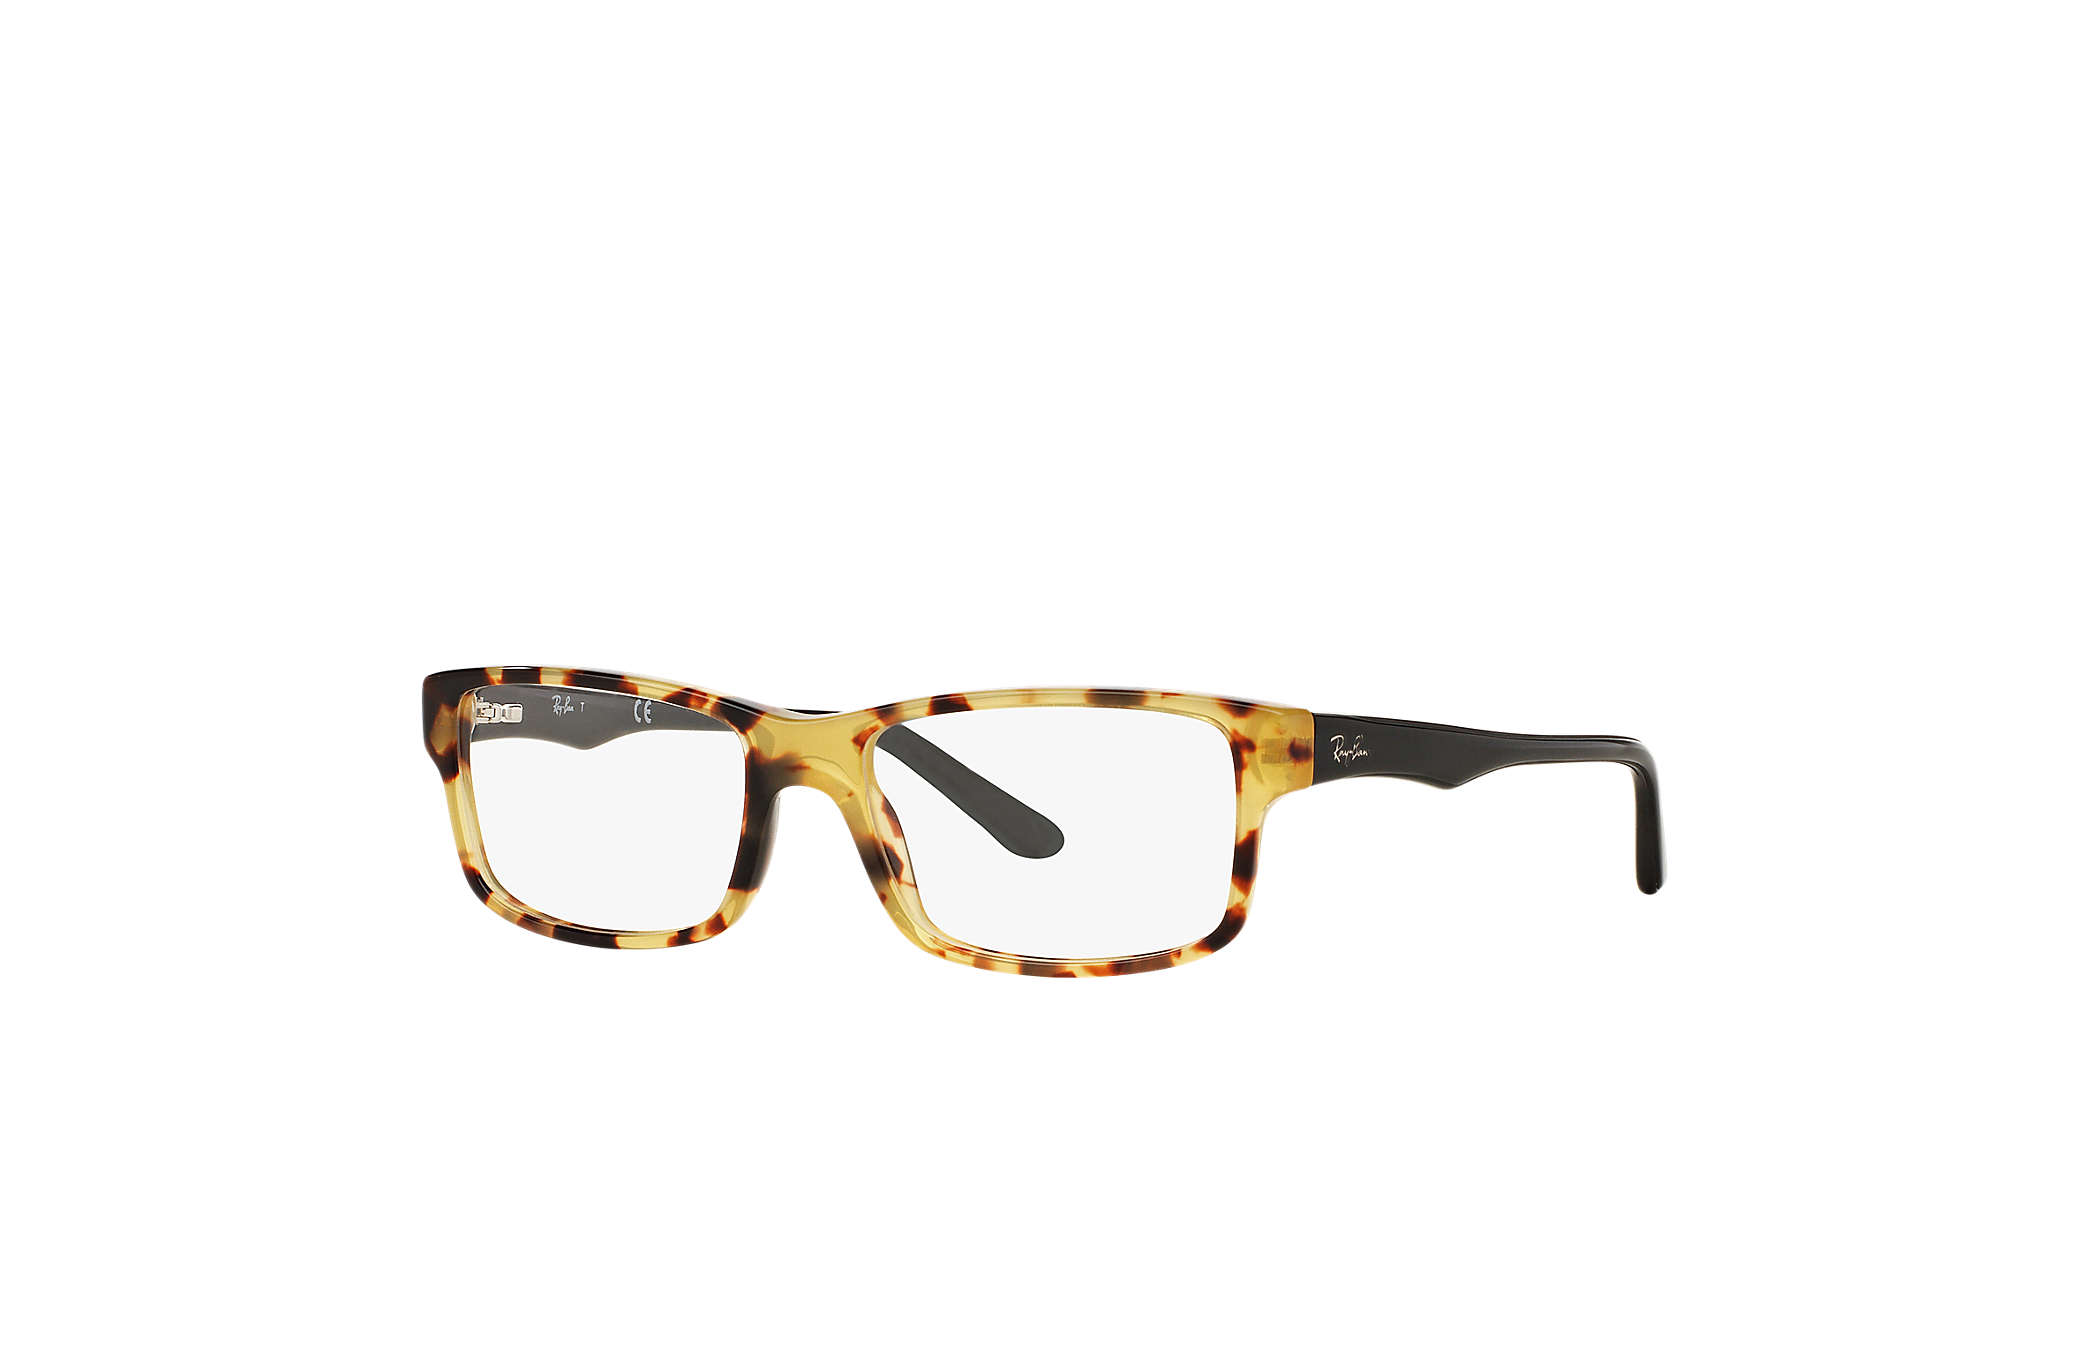 2b77dcbc71 Ray-Ban eyeglasses RB5245 Tortoise - Acetate - 0RX5245560854